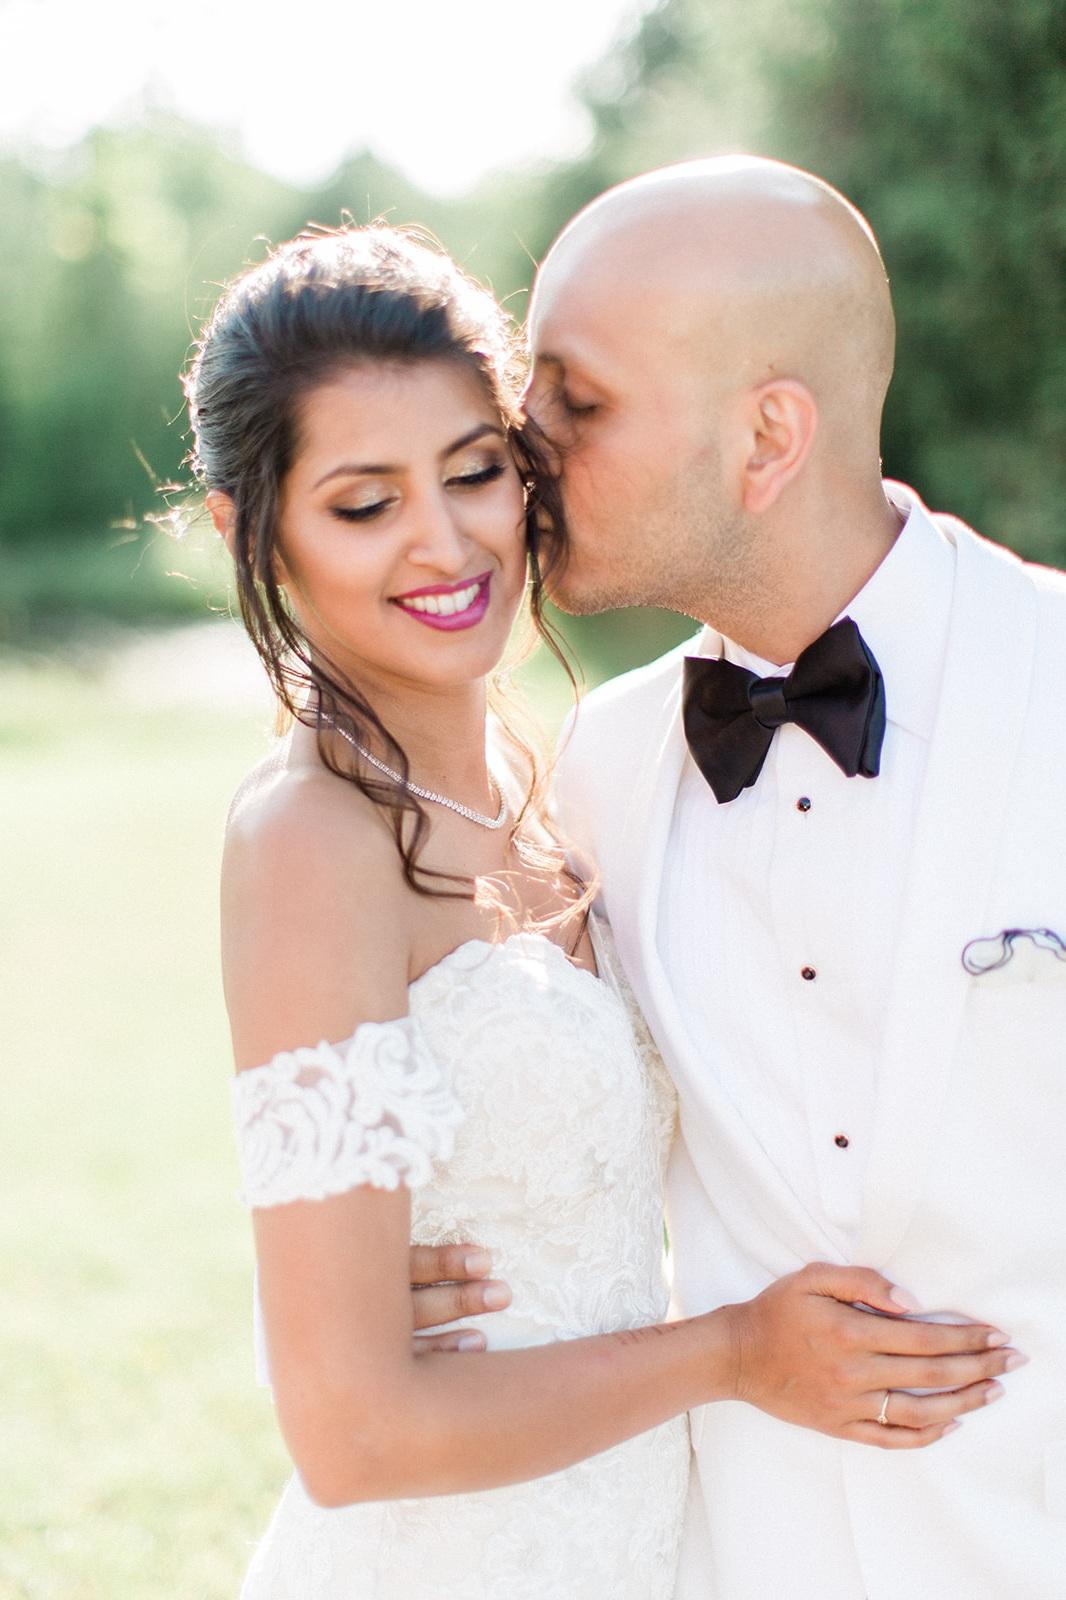 Wedding Makeup & Hair - BrideBridesmaidsMother of the Bride/GroomFlower GirlsGroomFamily/Guests